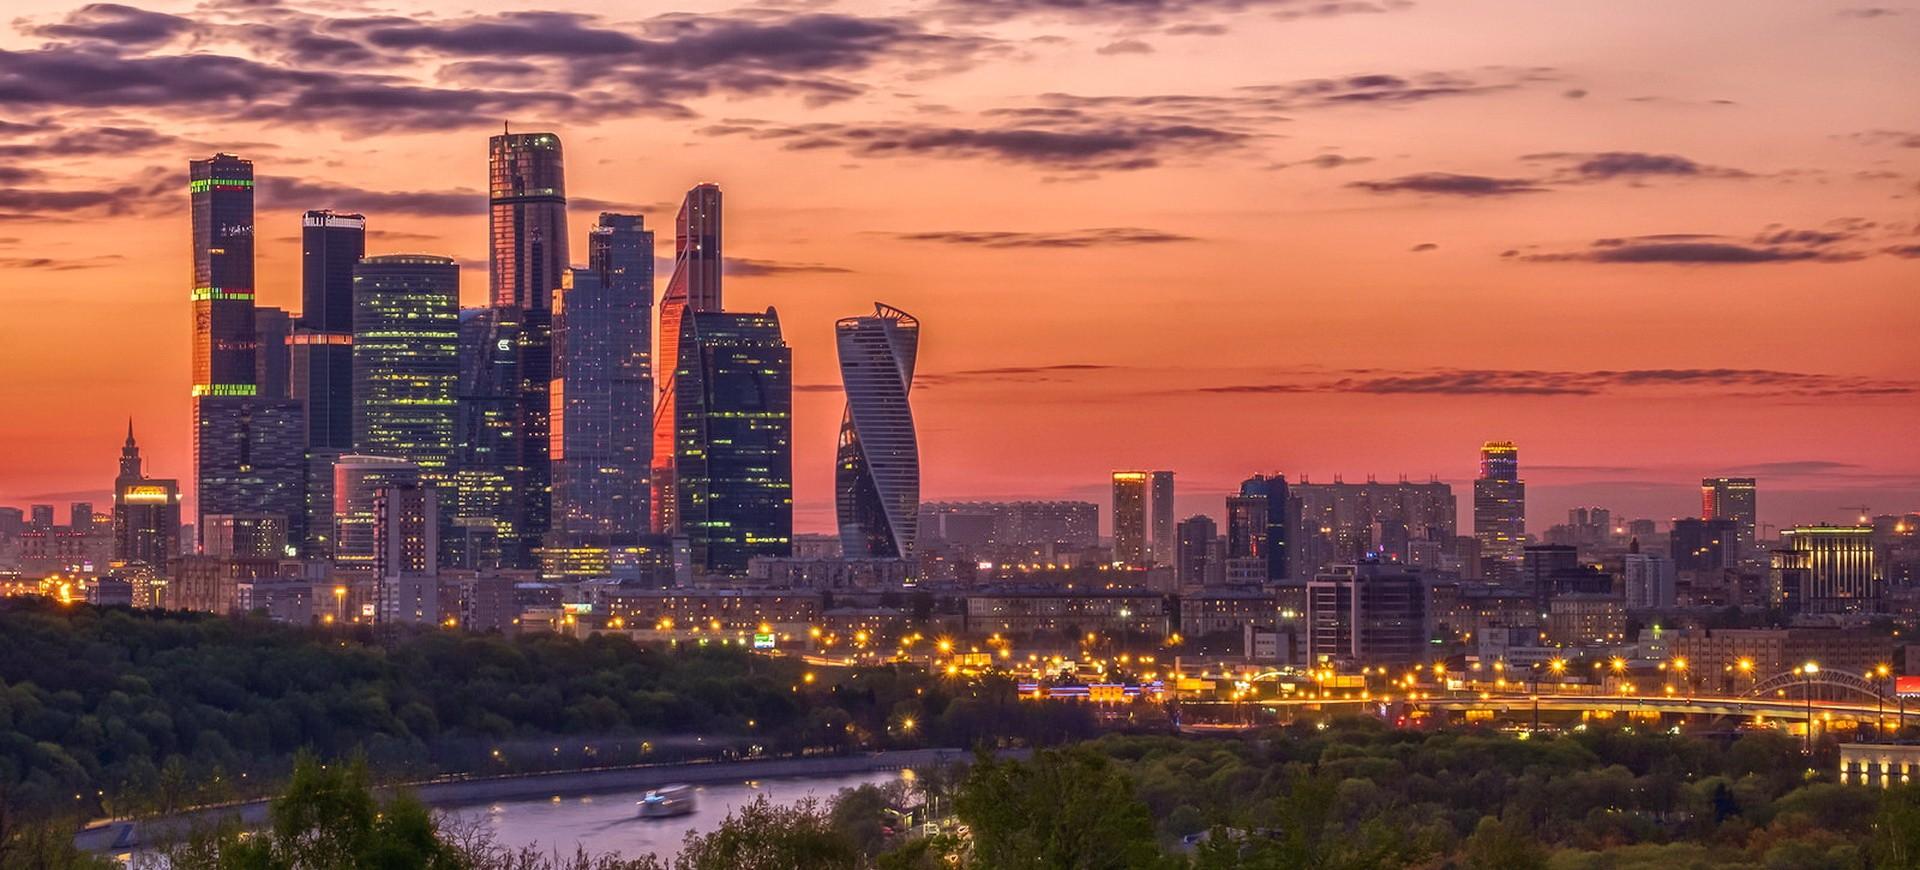 Russie Moscou Skyline